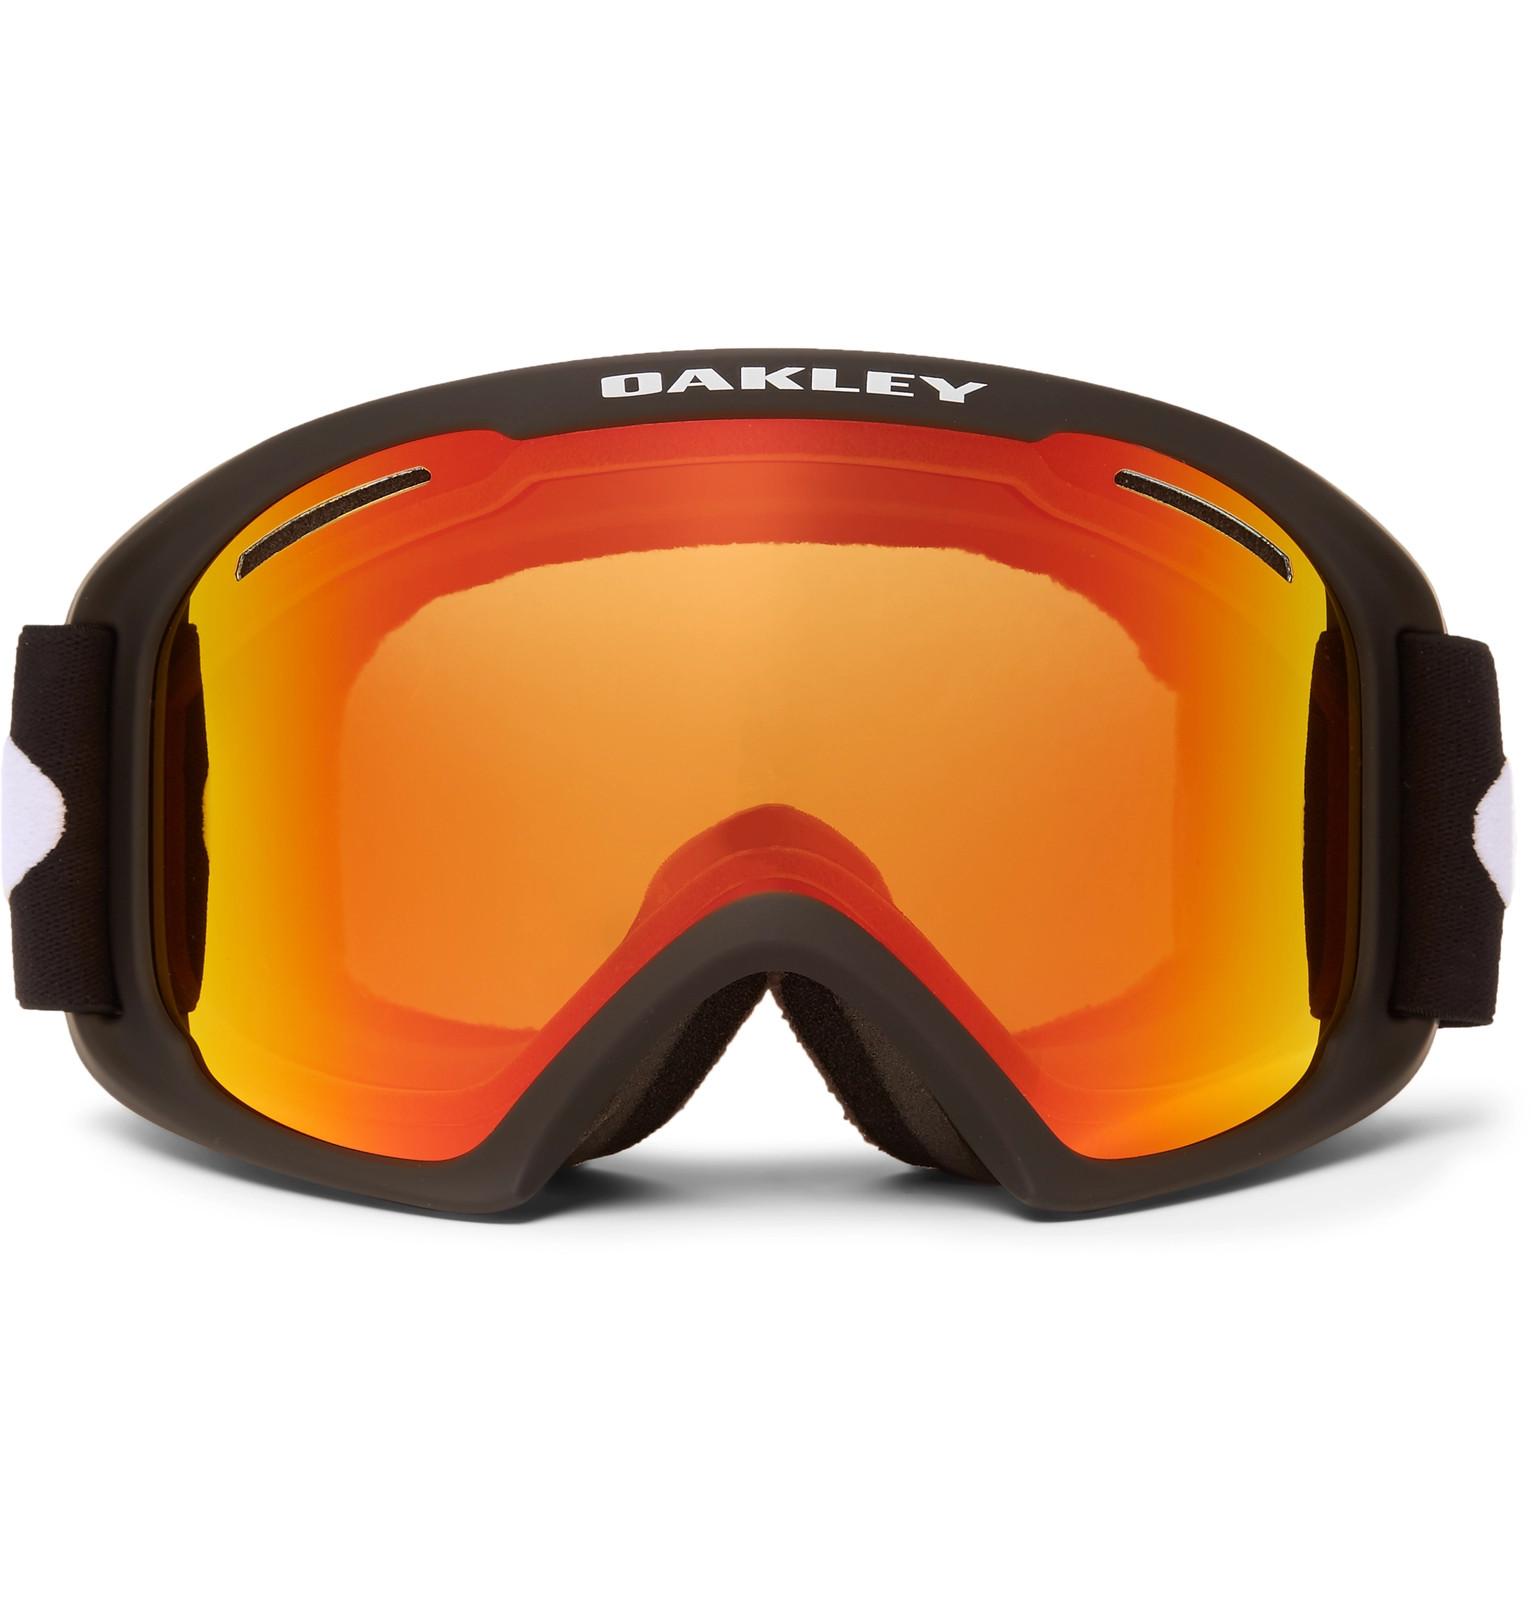 868c52d2b49 Oakley - O Frame 2.0 XL Snow Goggles